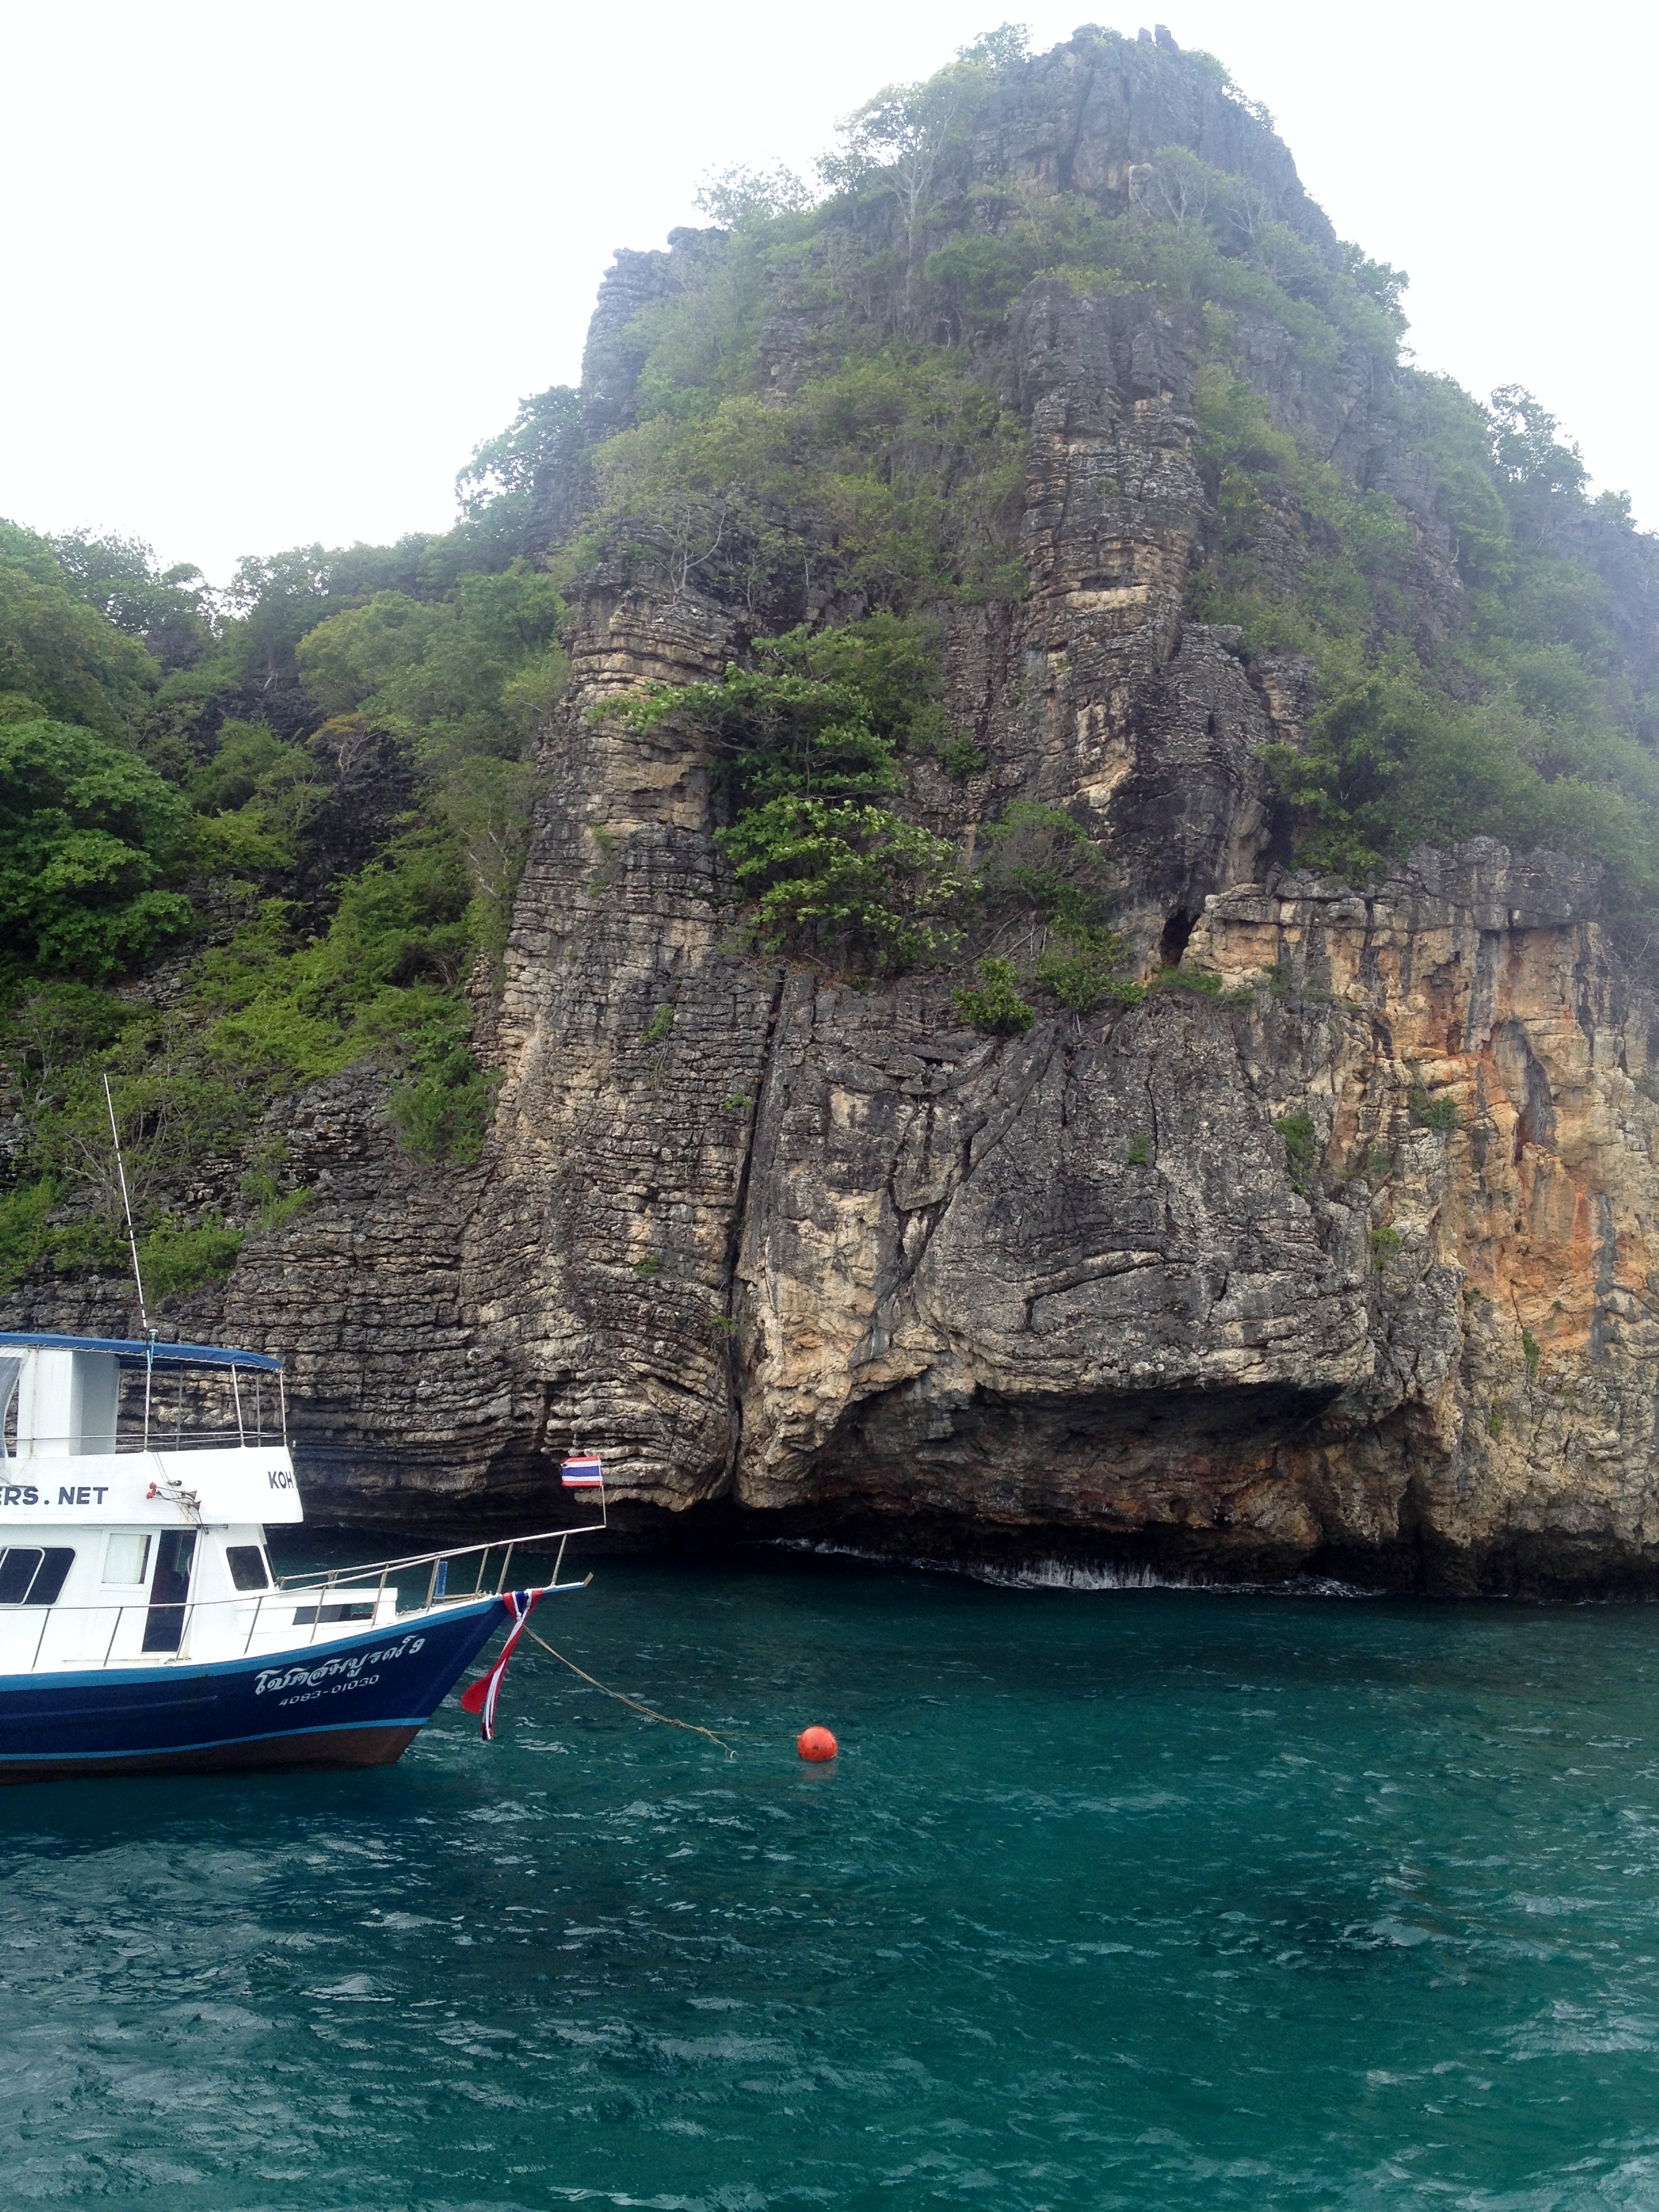 Island Hopping The Andaman Sea